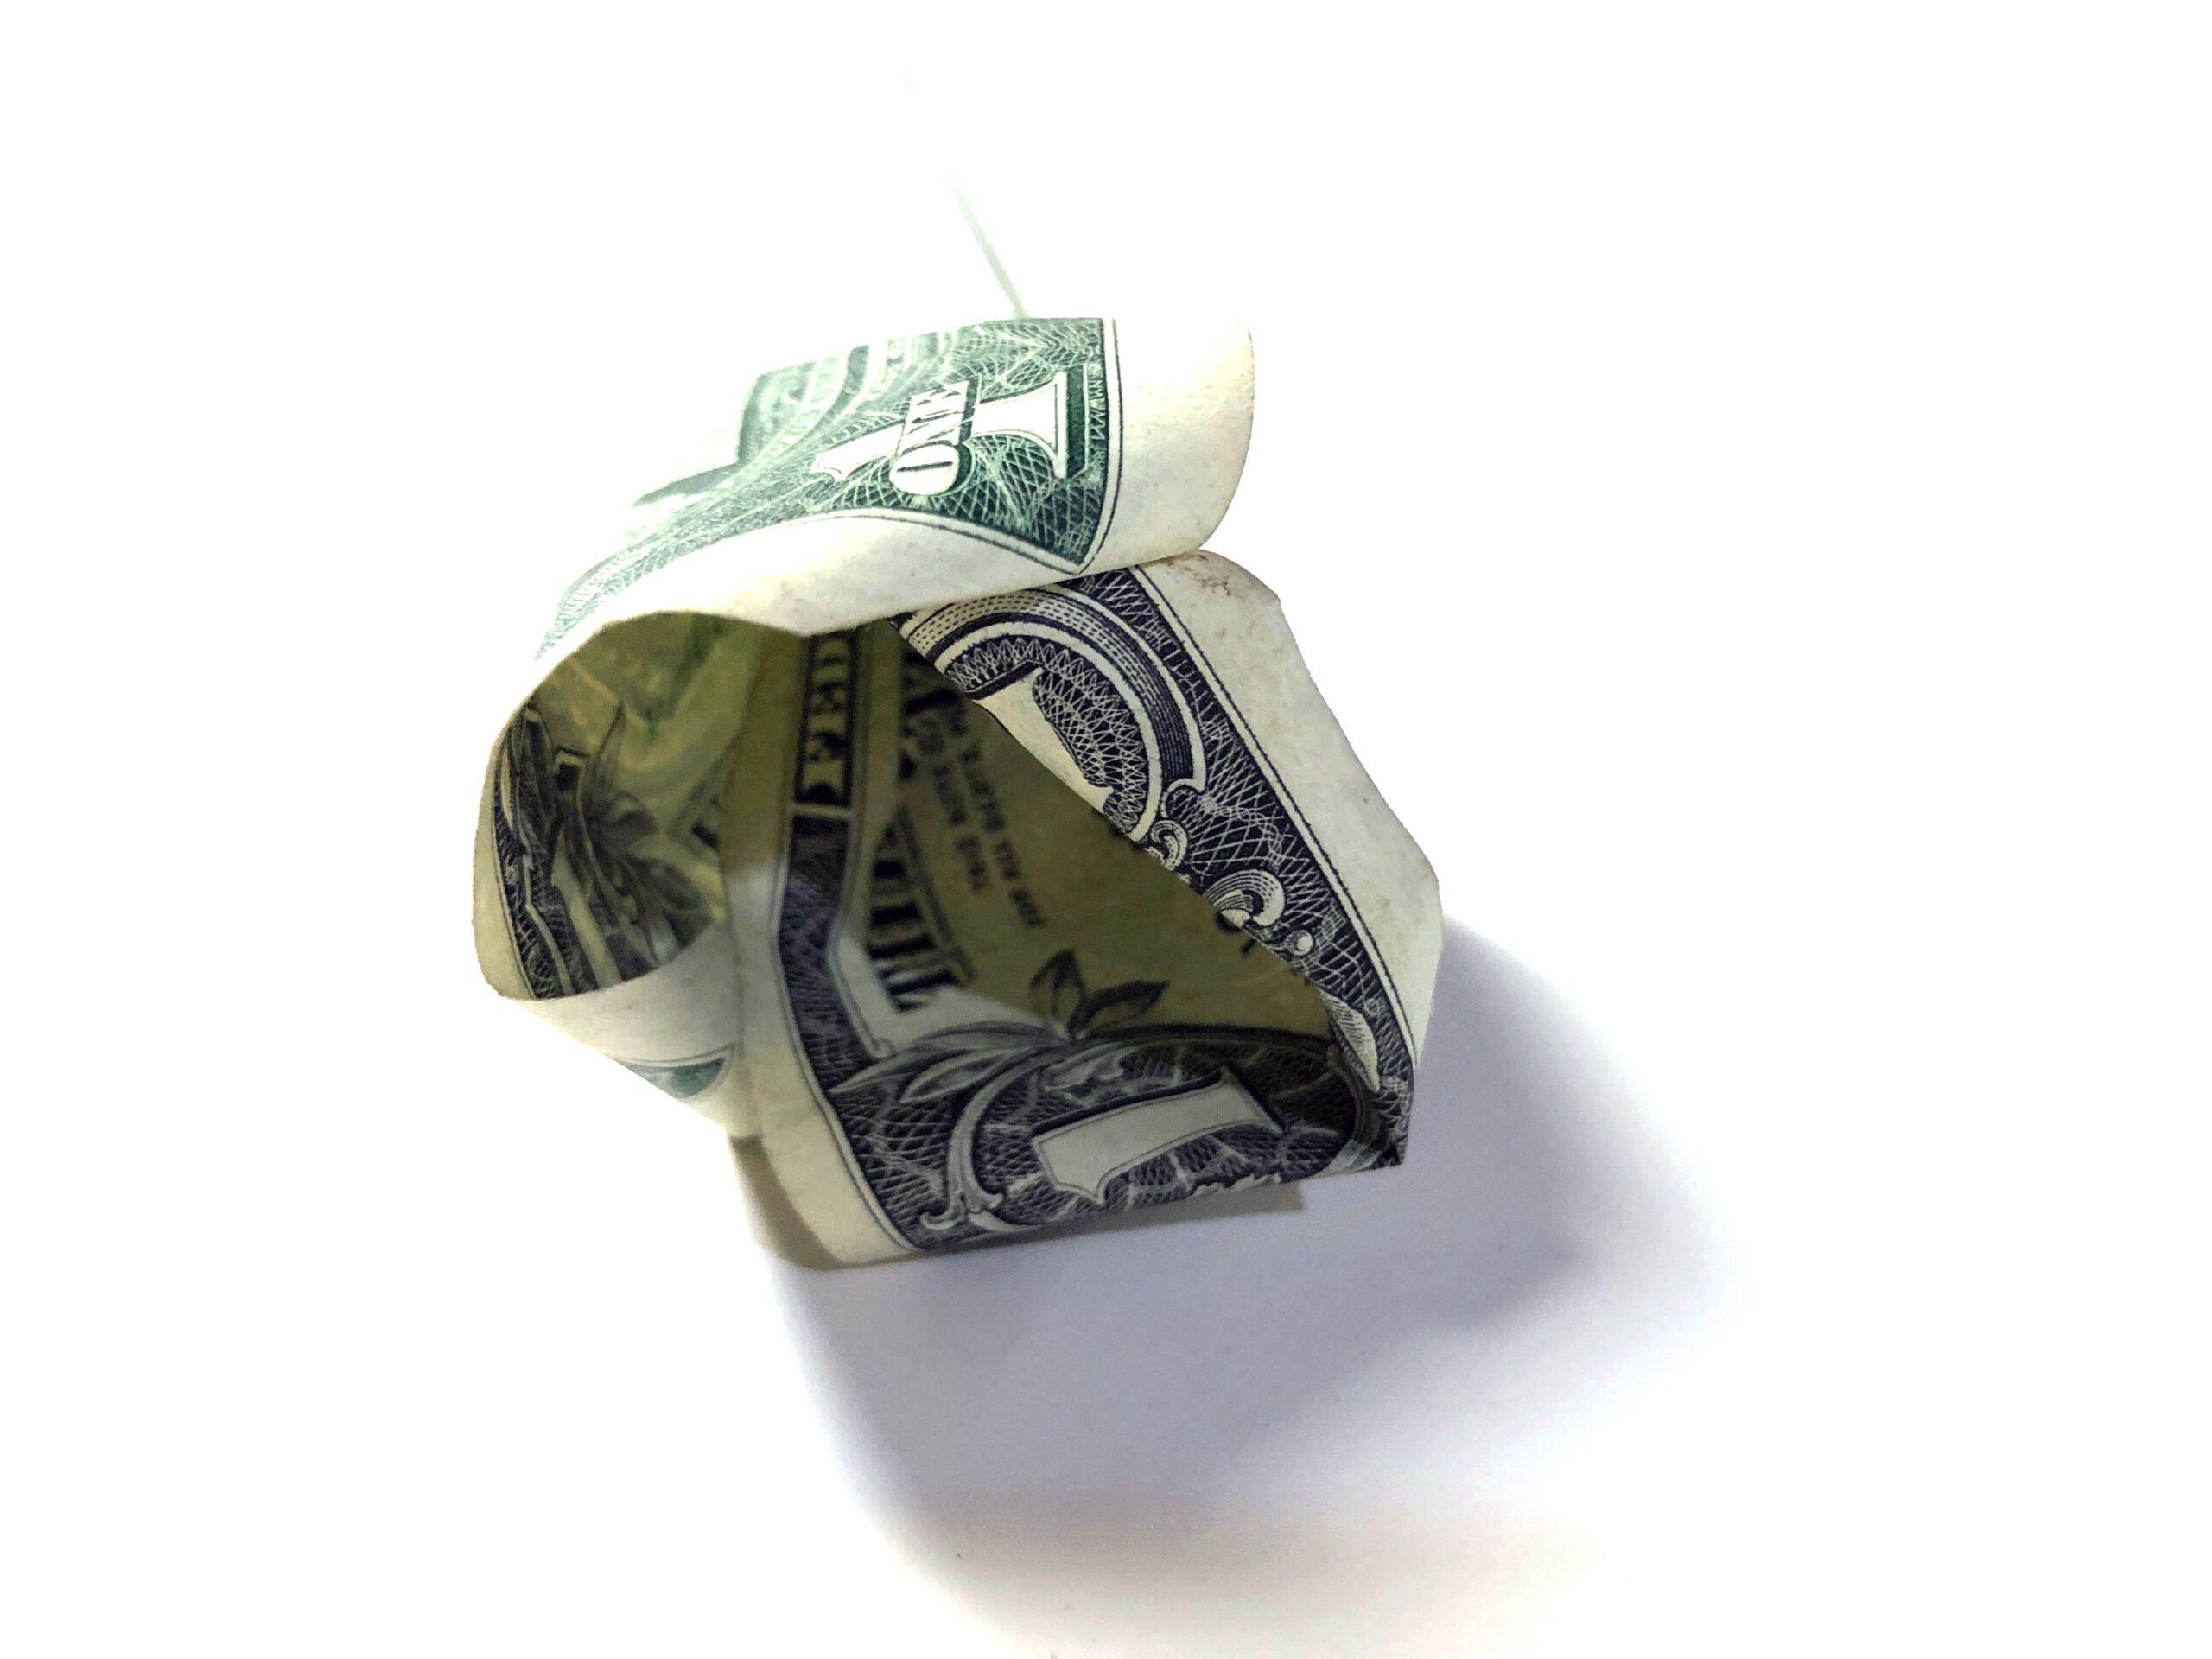 the center of the dollar money rose